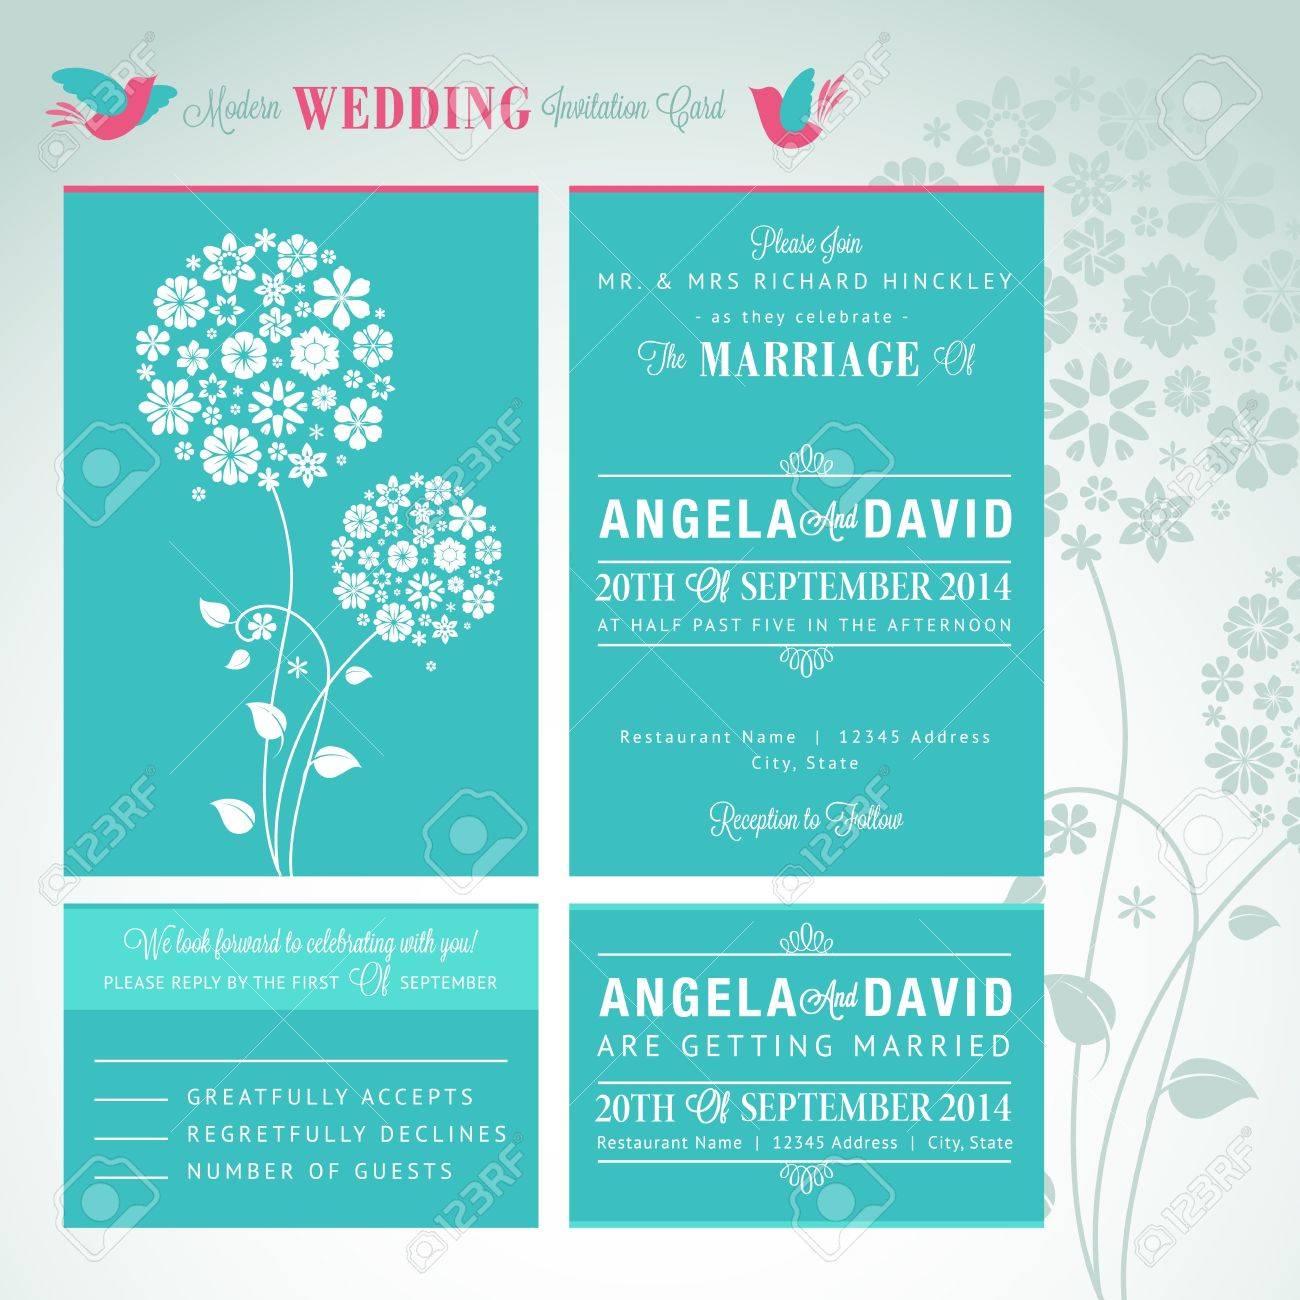 Modern Wedding Invitation Card Royalty Free Cliparts, Vectors, And ...